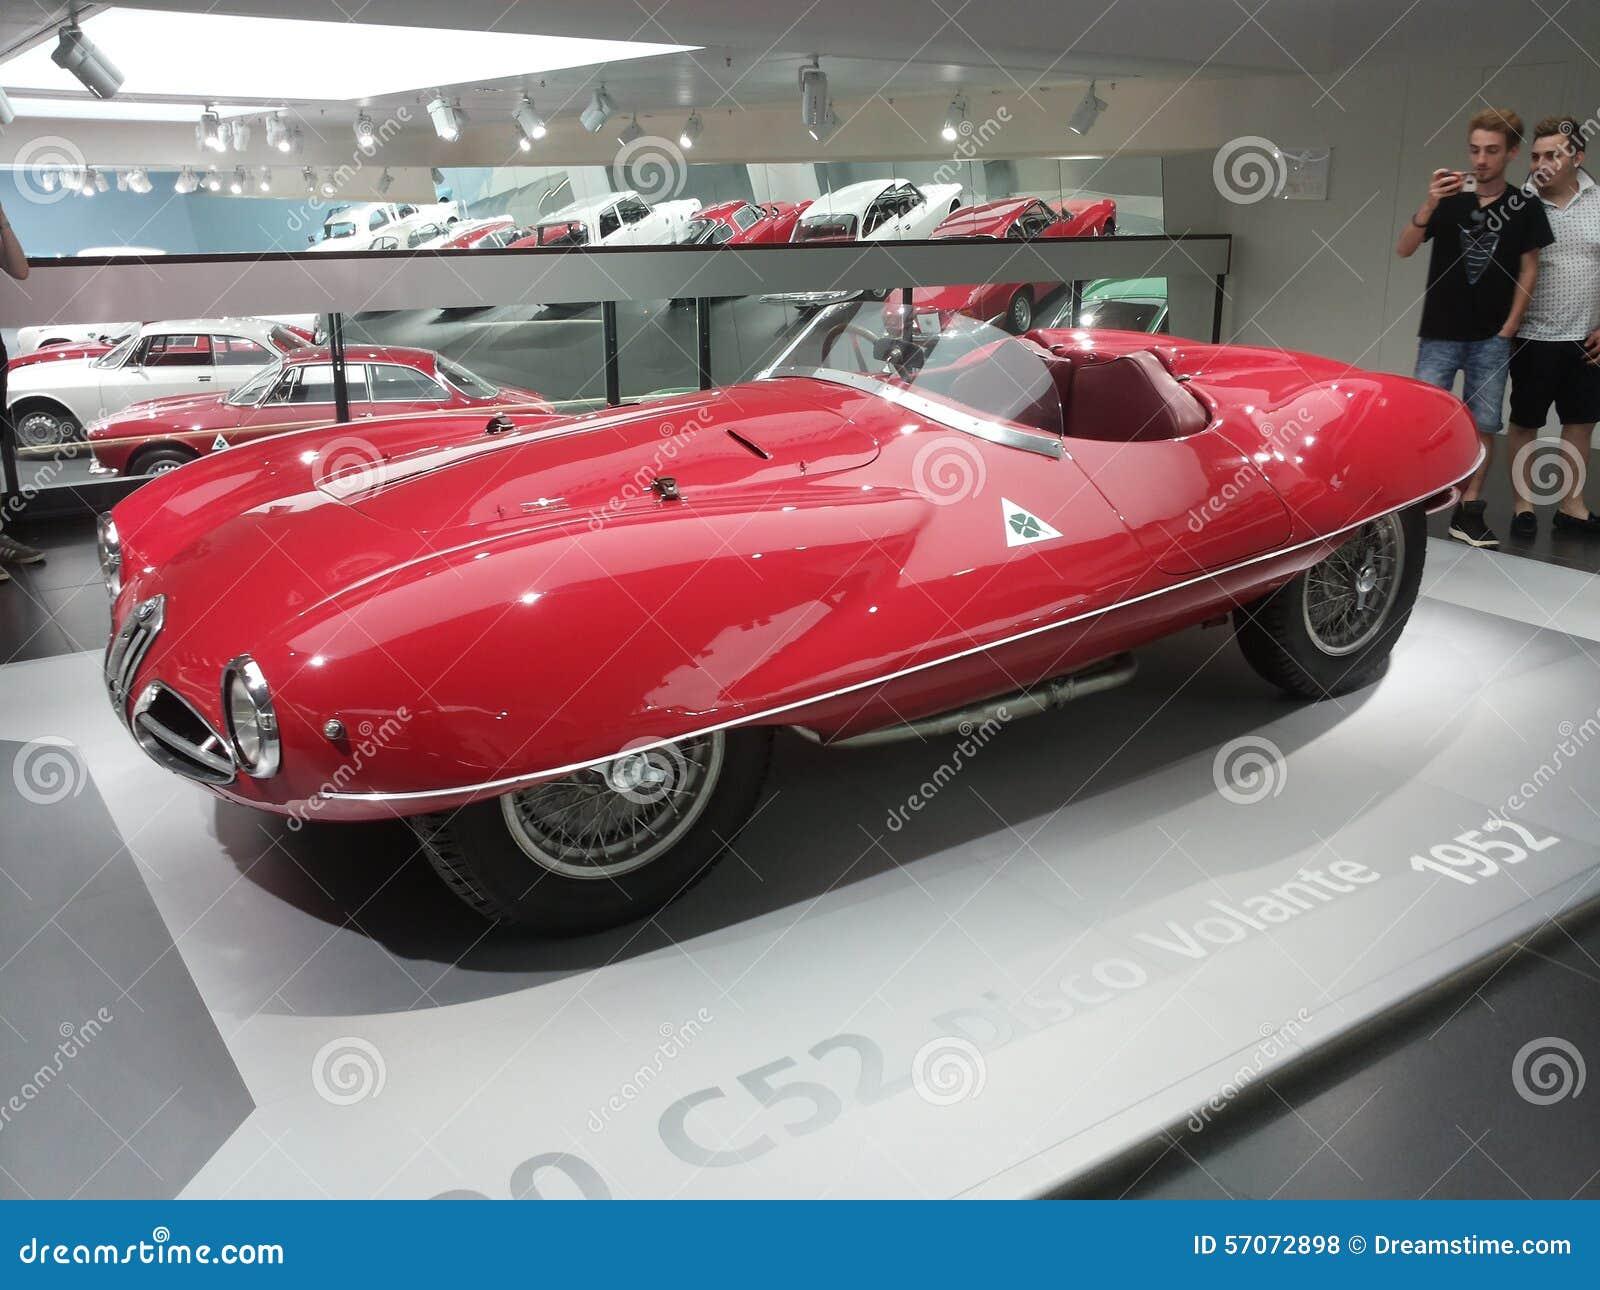 Van de alpha- van de autoauto s romeodisco volante 1952 super nuvolari